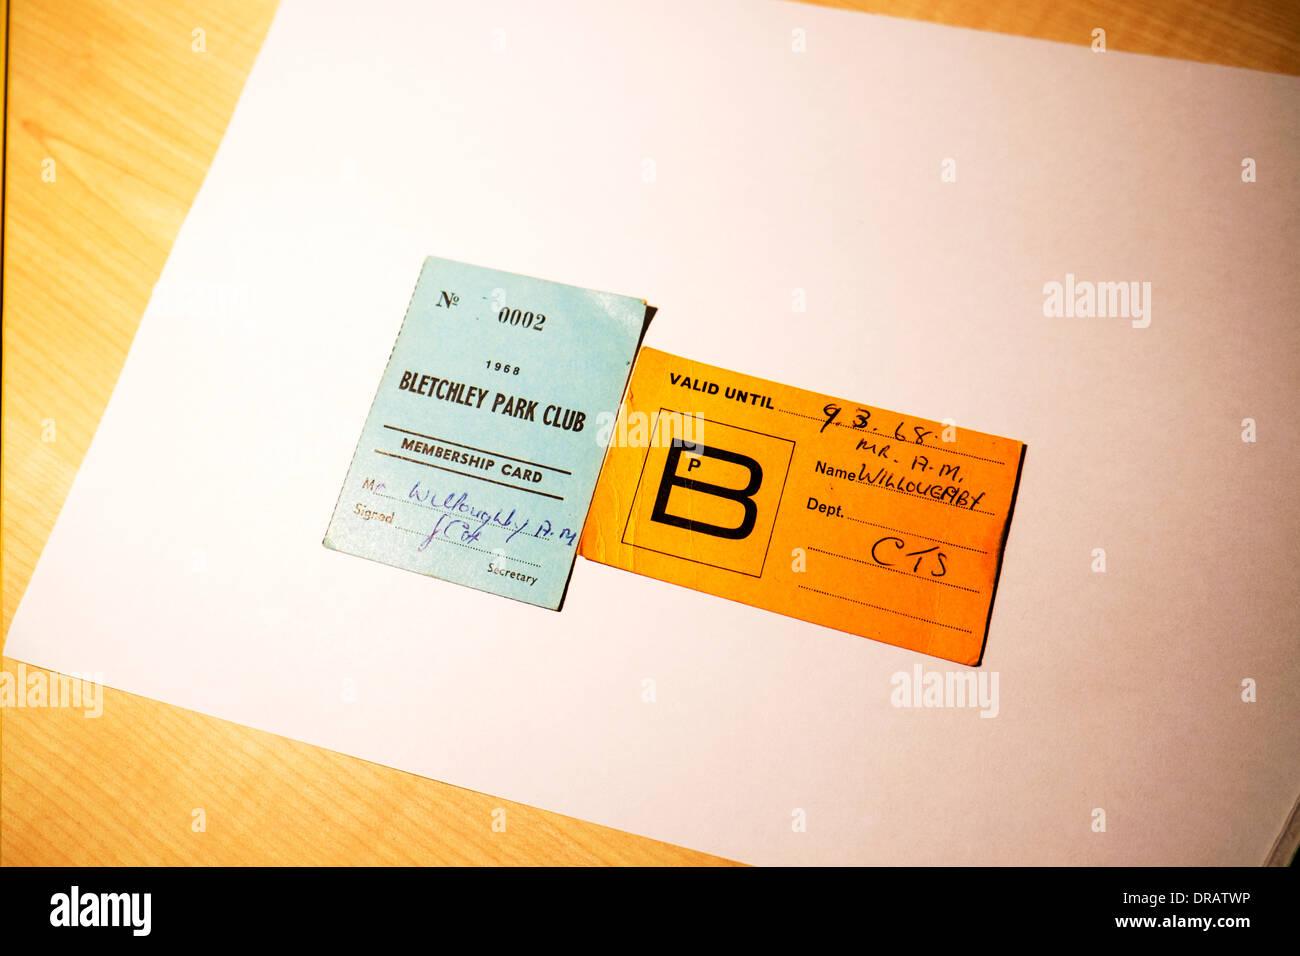 Bletchley Park club membership card 1968 original car park ticket stub Secret Intelligence and Computers Headquarters - Stock Image